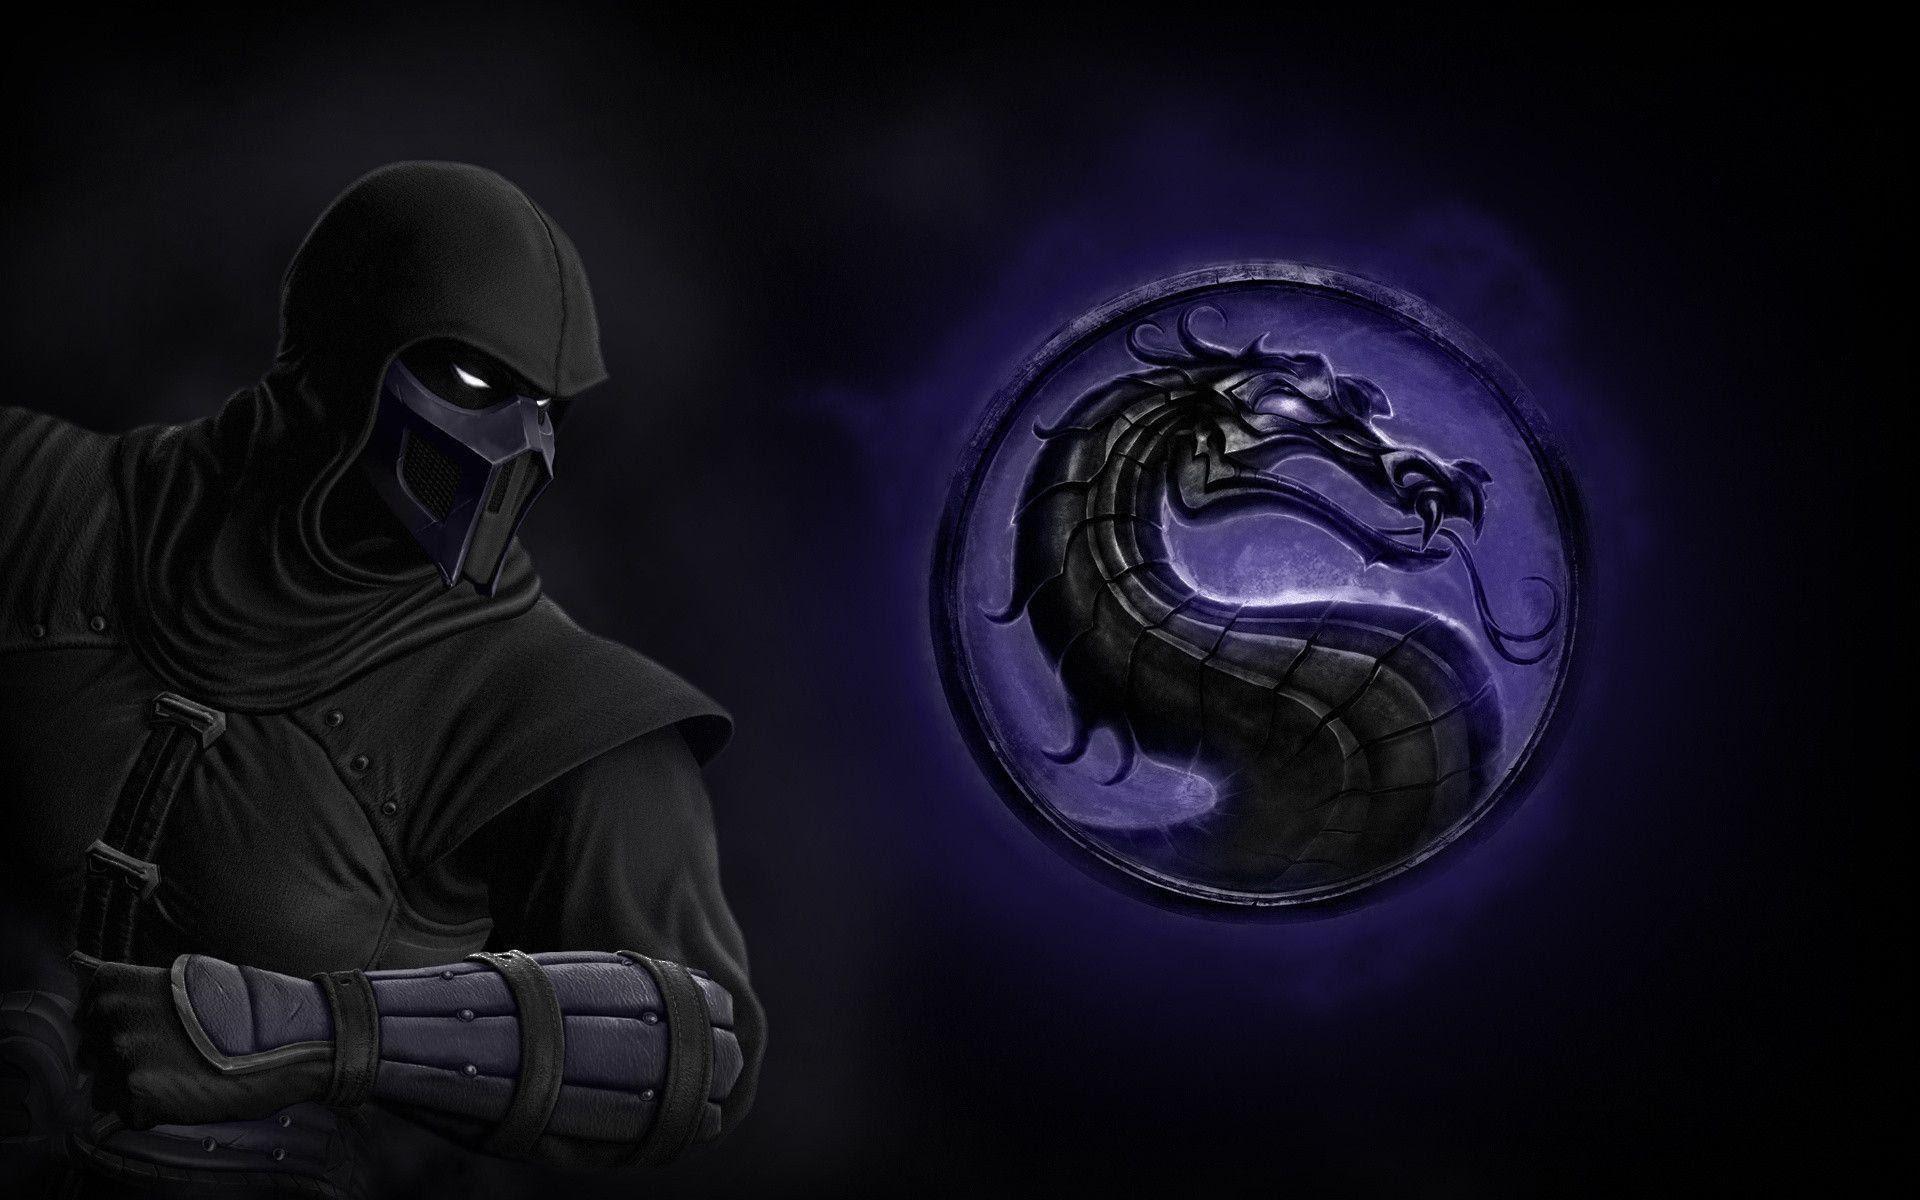 Mortal Kombat Wallpapers Hd Wallpaper Cave